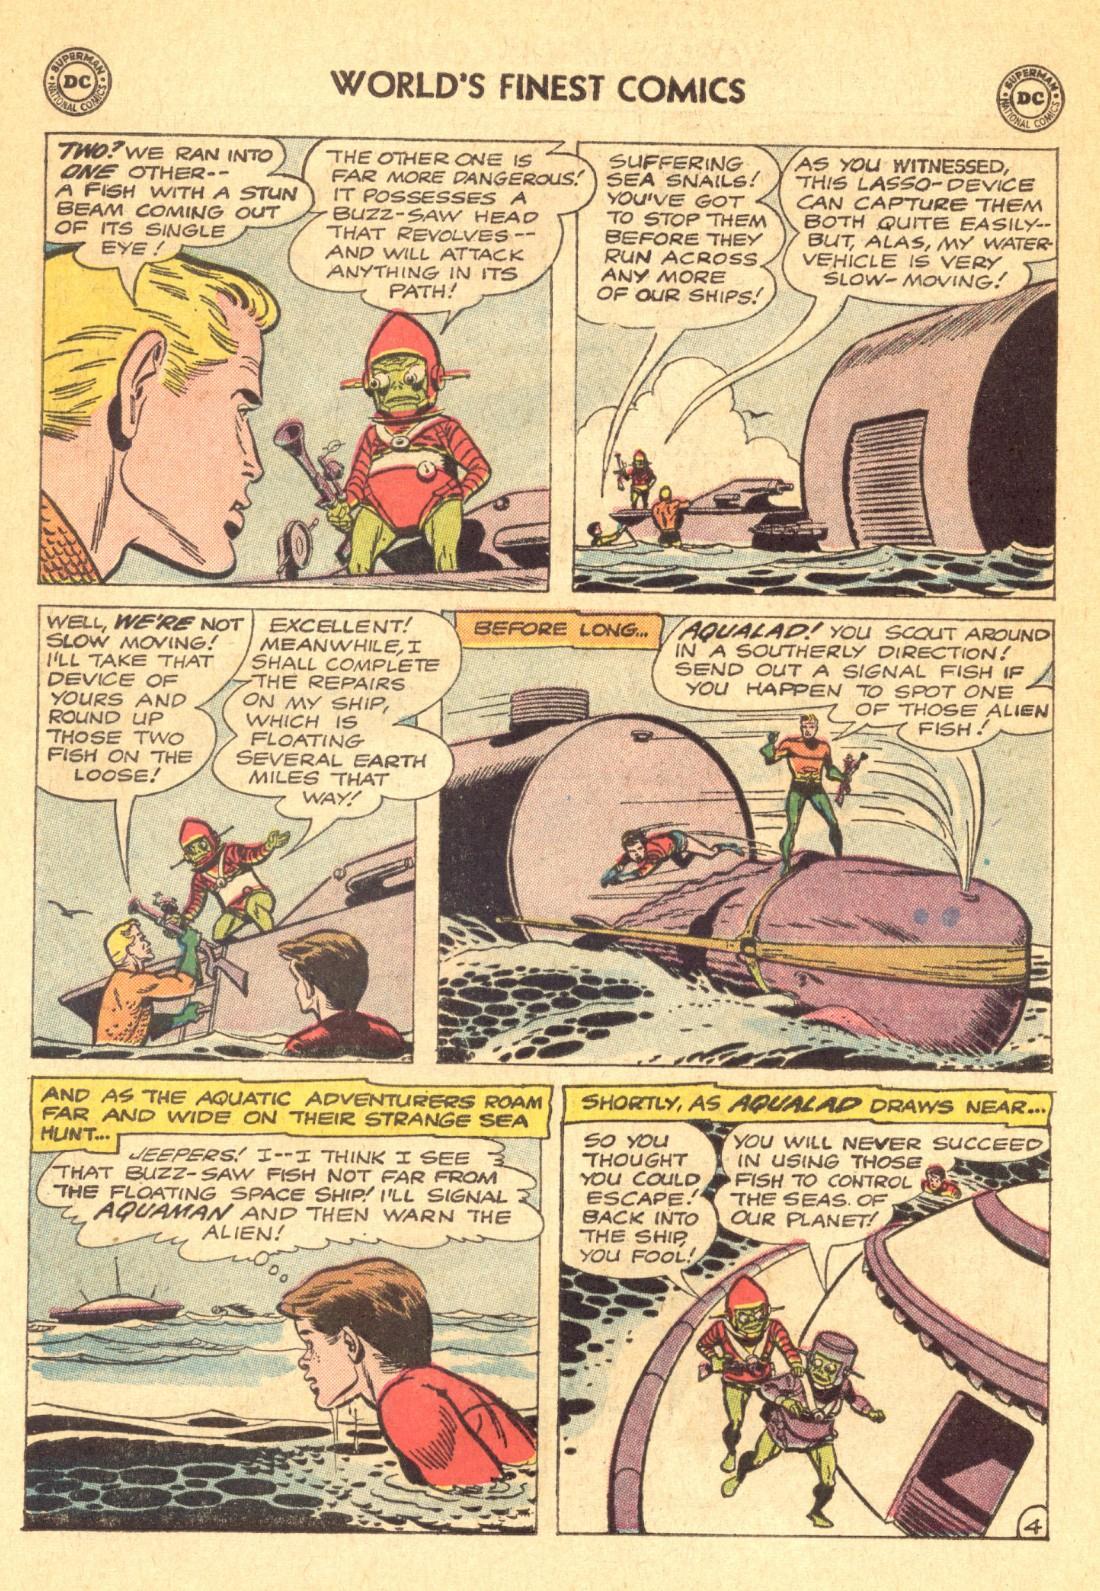 Read online World's Finest Comics comic -  Issue #129 - 22